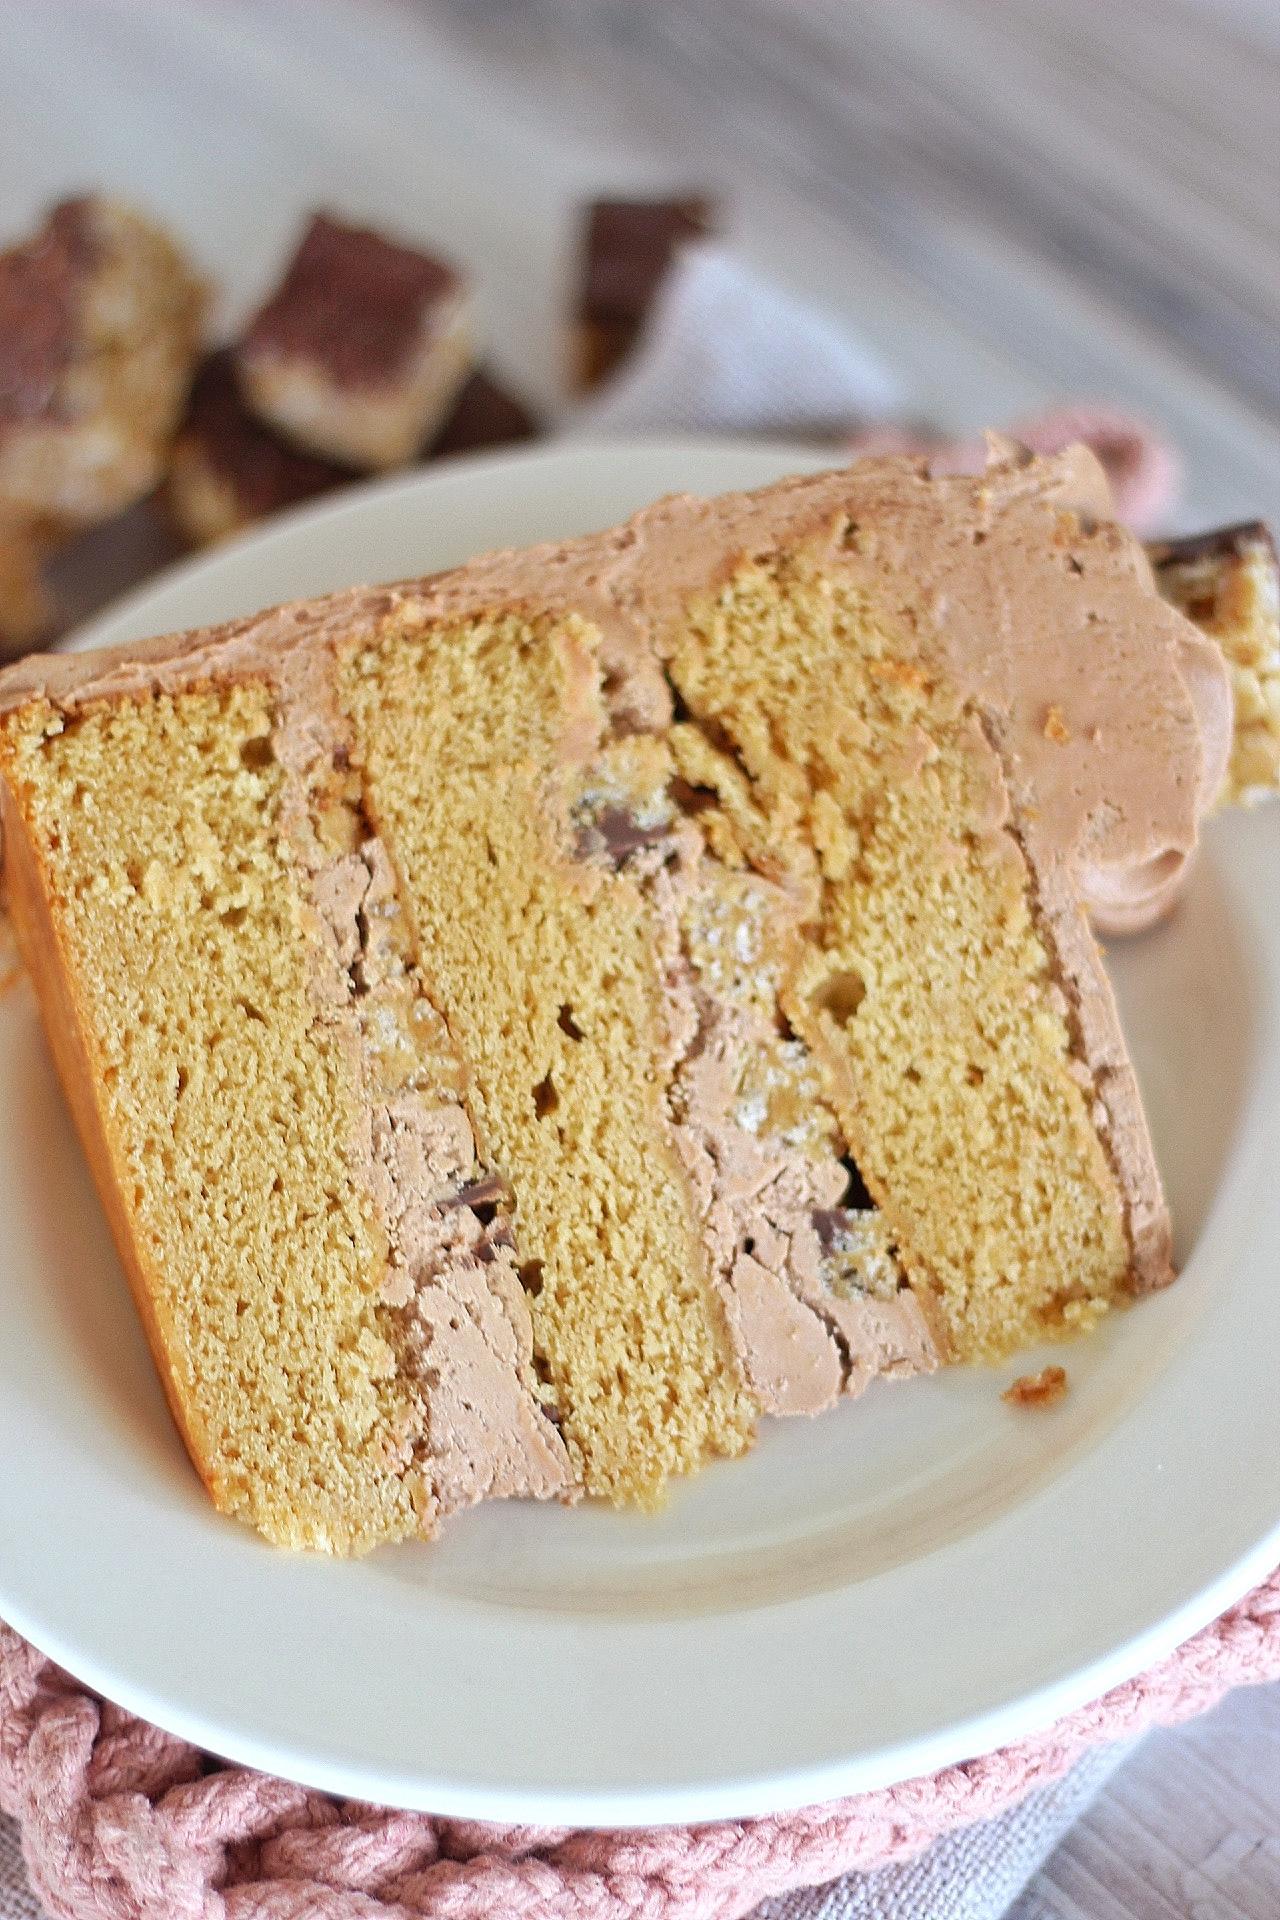 Scotcheroo Cake - caramel peanut butter cake layers with chocolate butterscotch buttercream #cake #cakerecipe #scotcheroo #scotcheroocake #scotcheroorecipe